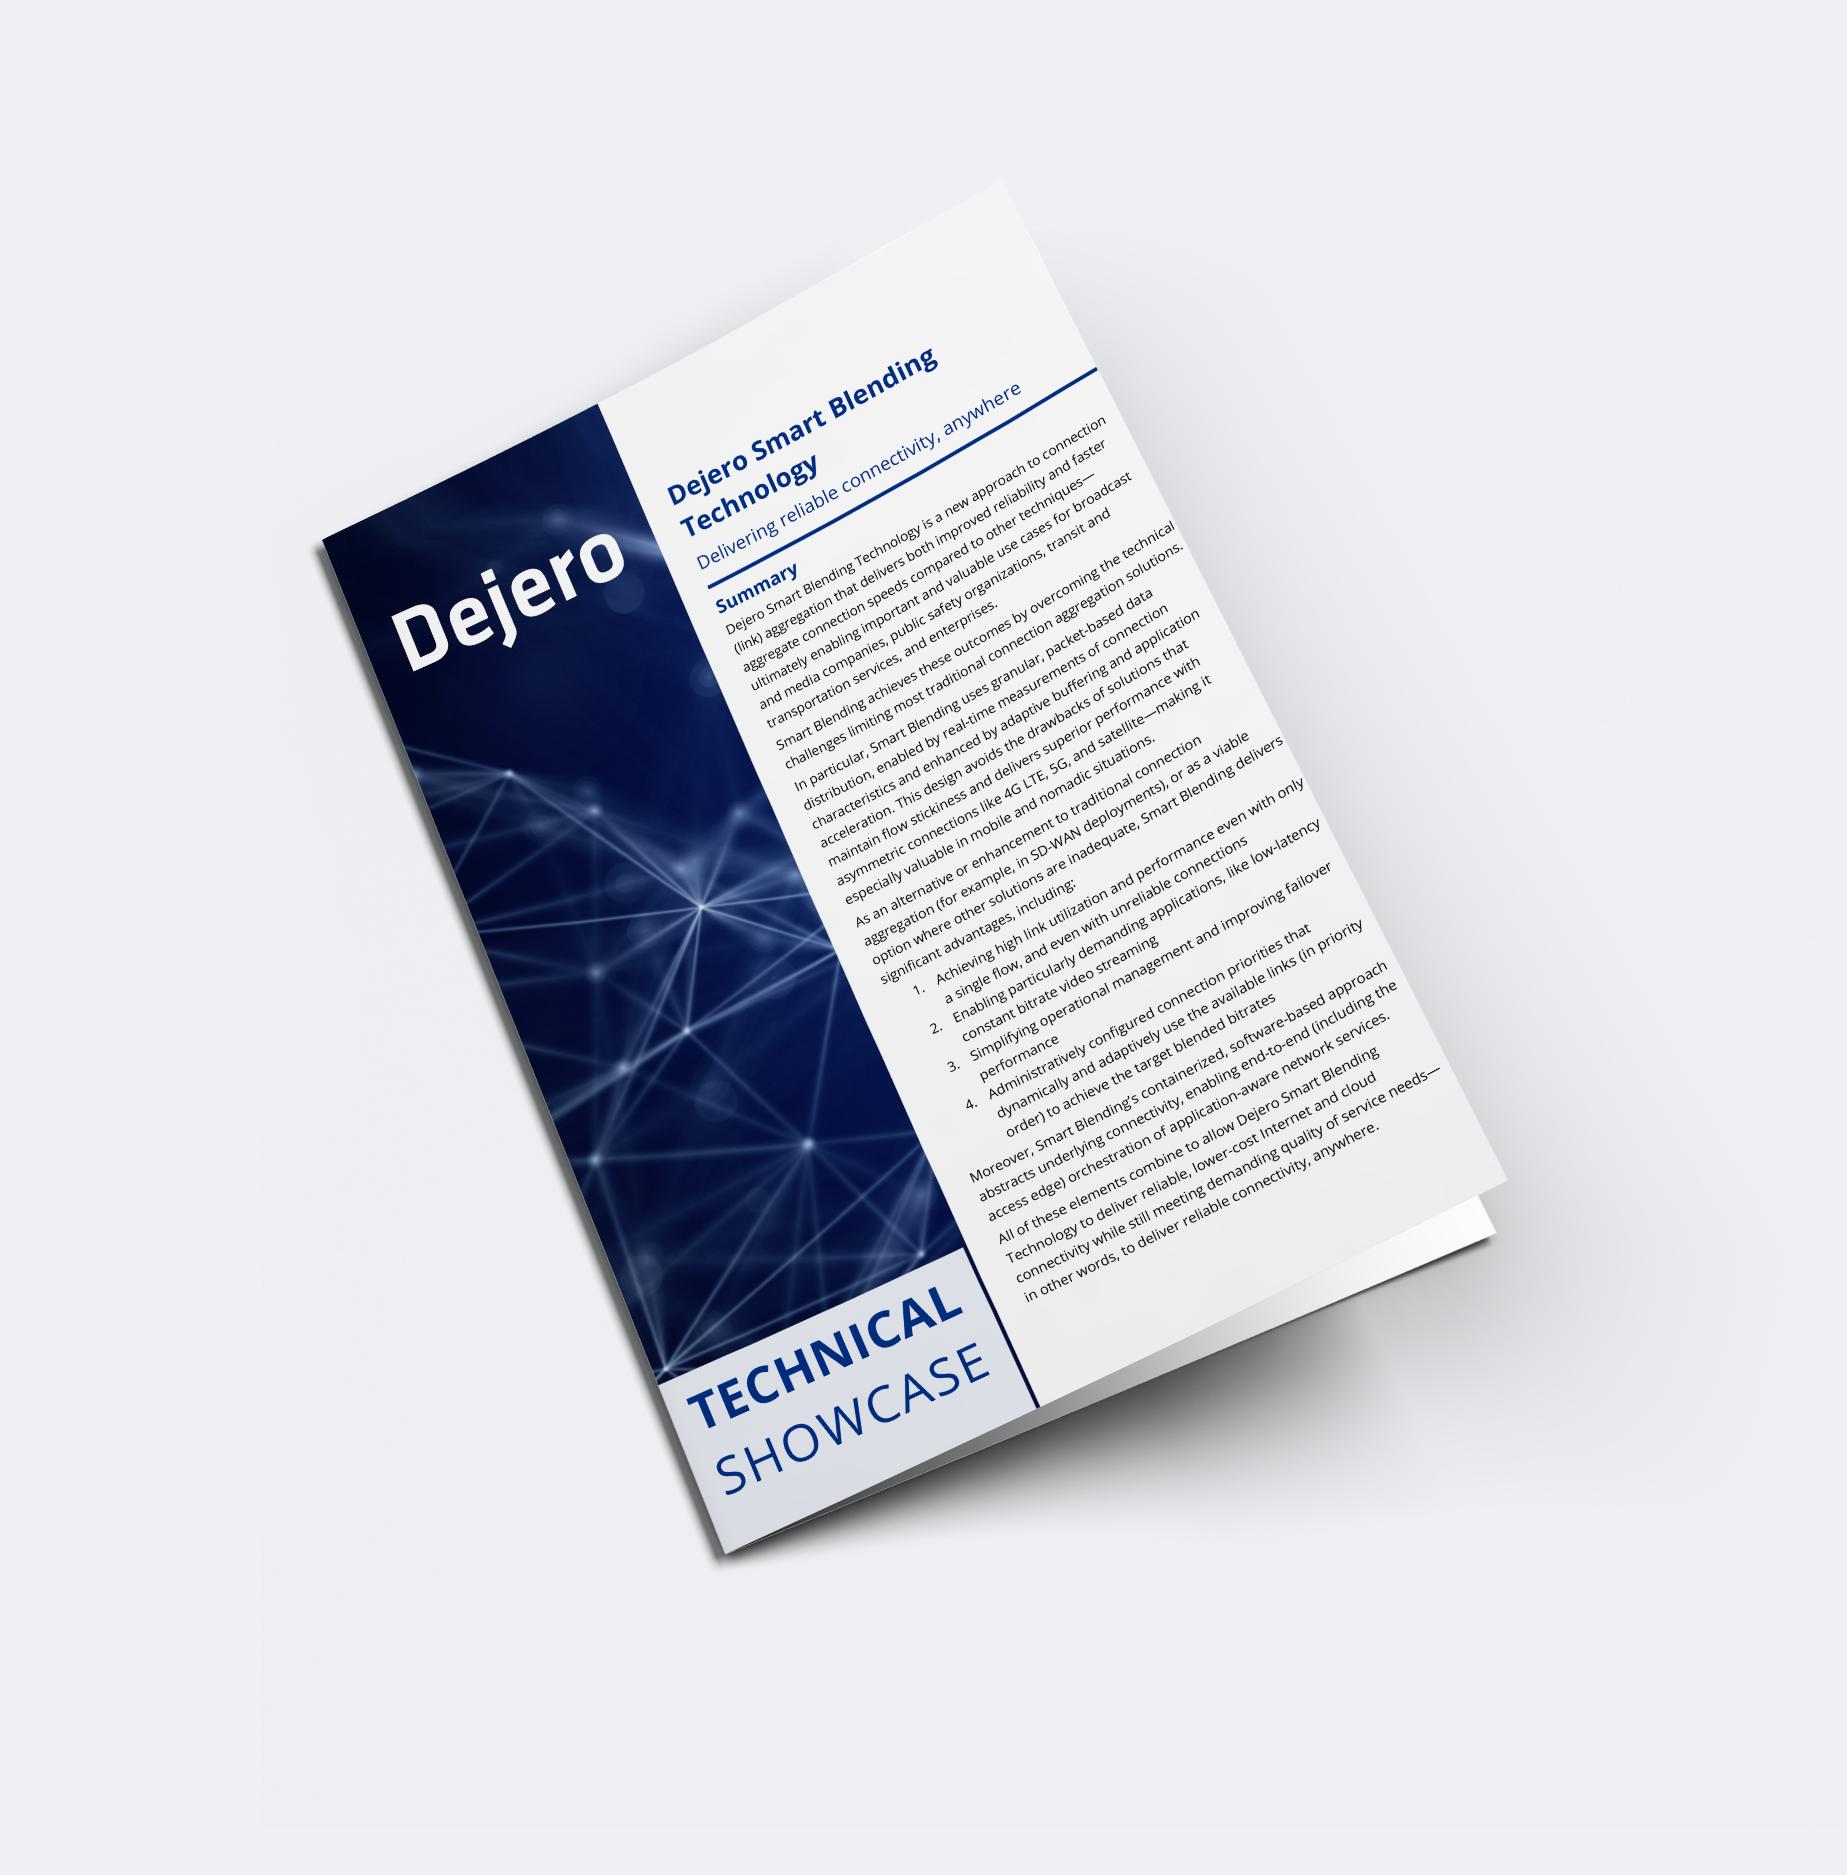 Smart Blending Technology Technical Showcase Paper